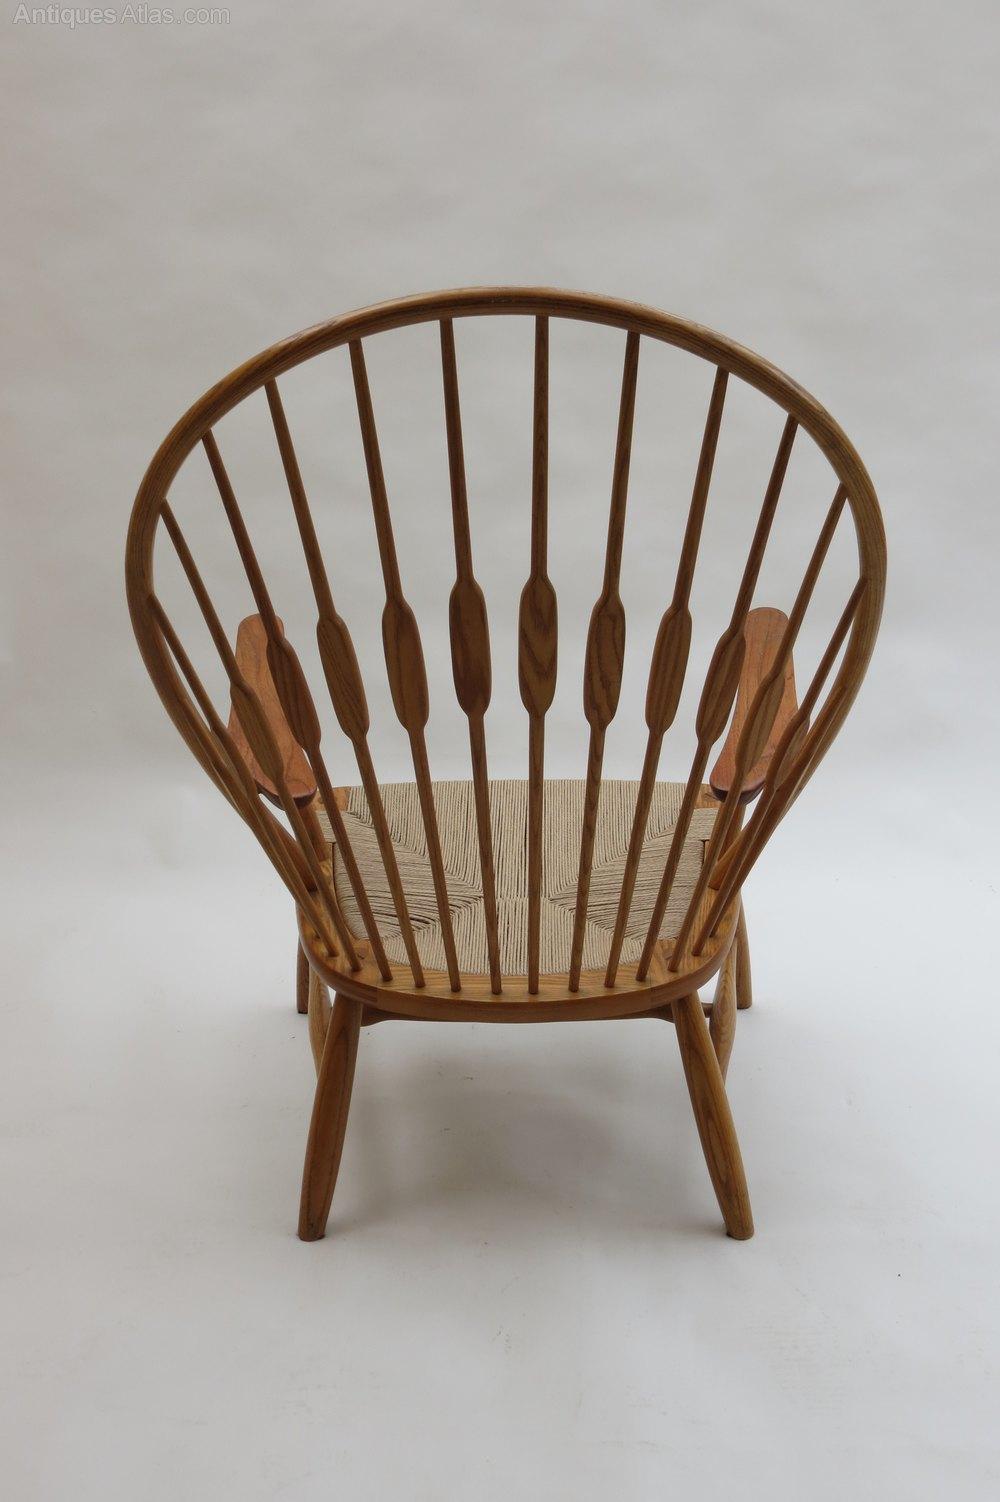 hans wegner peacock chair. Original Peacock Chair By Hans J Wegner 1960s Armchairs, Occasional Chairs